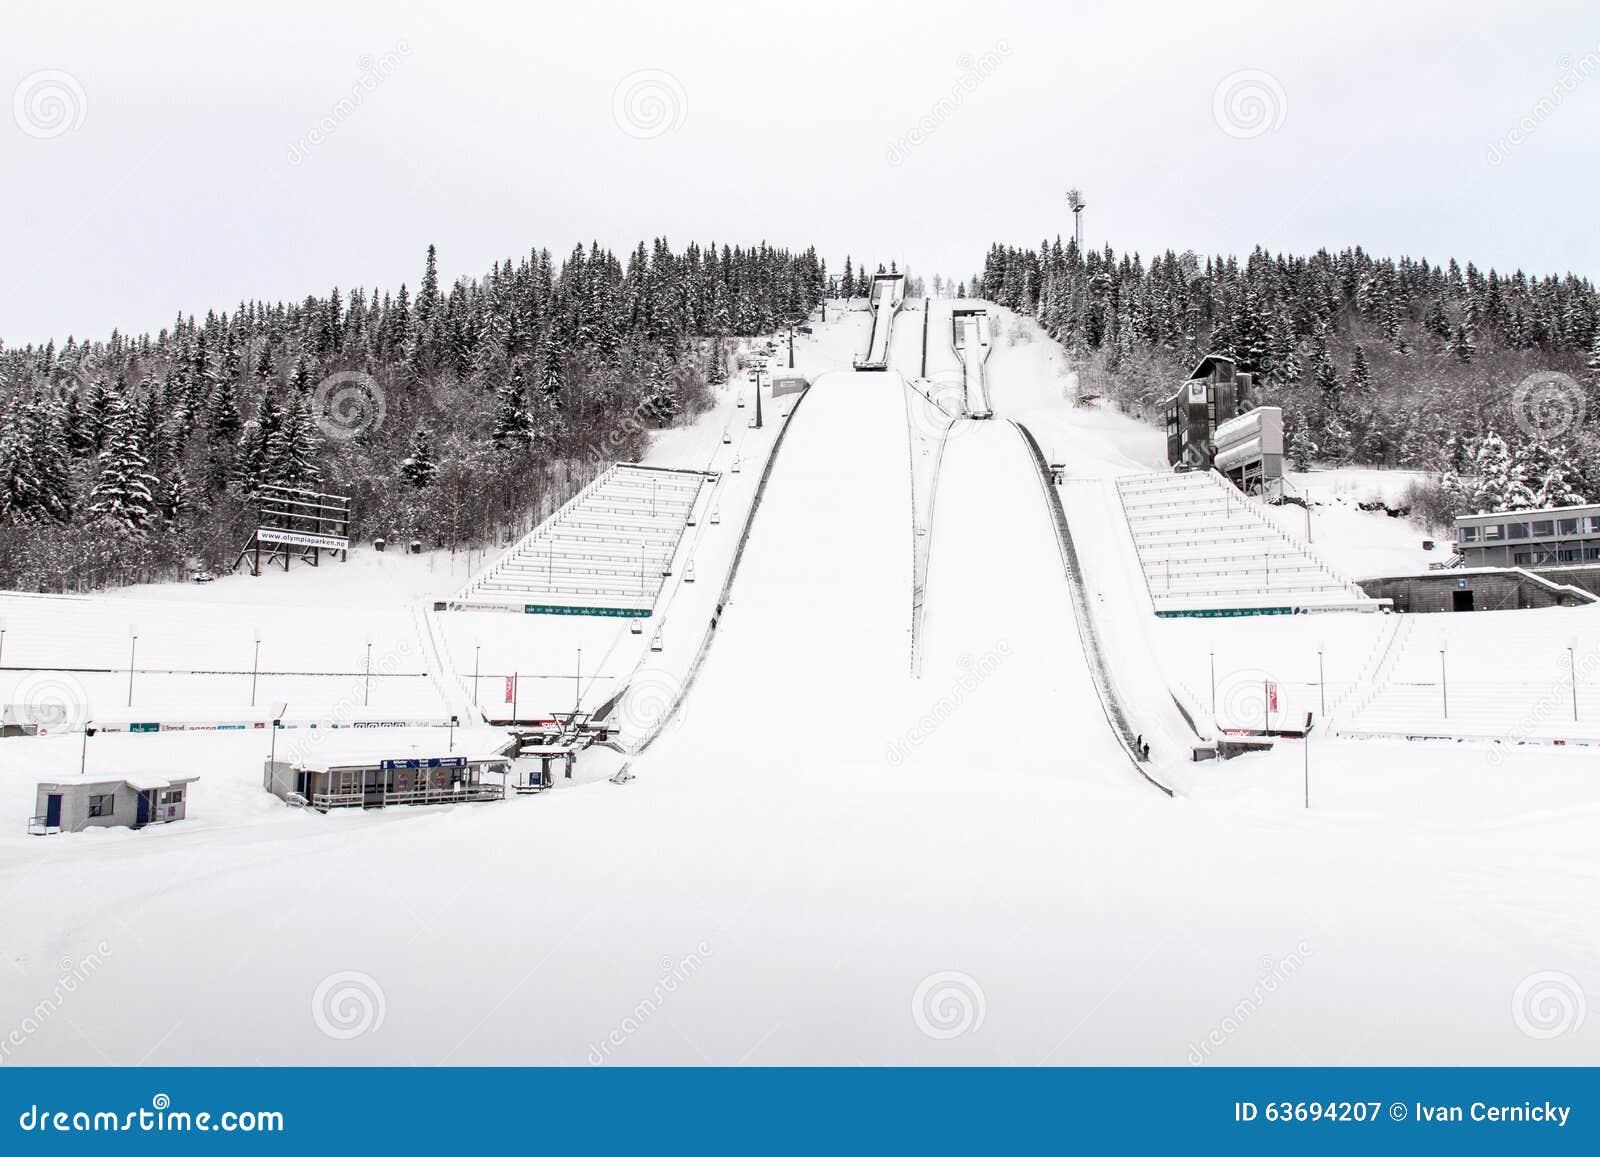 Torres desalto de Lillehammer